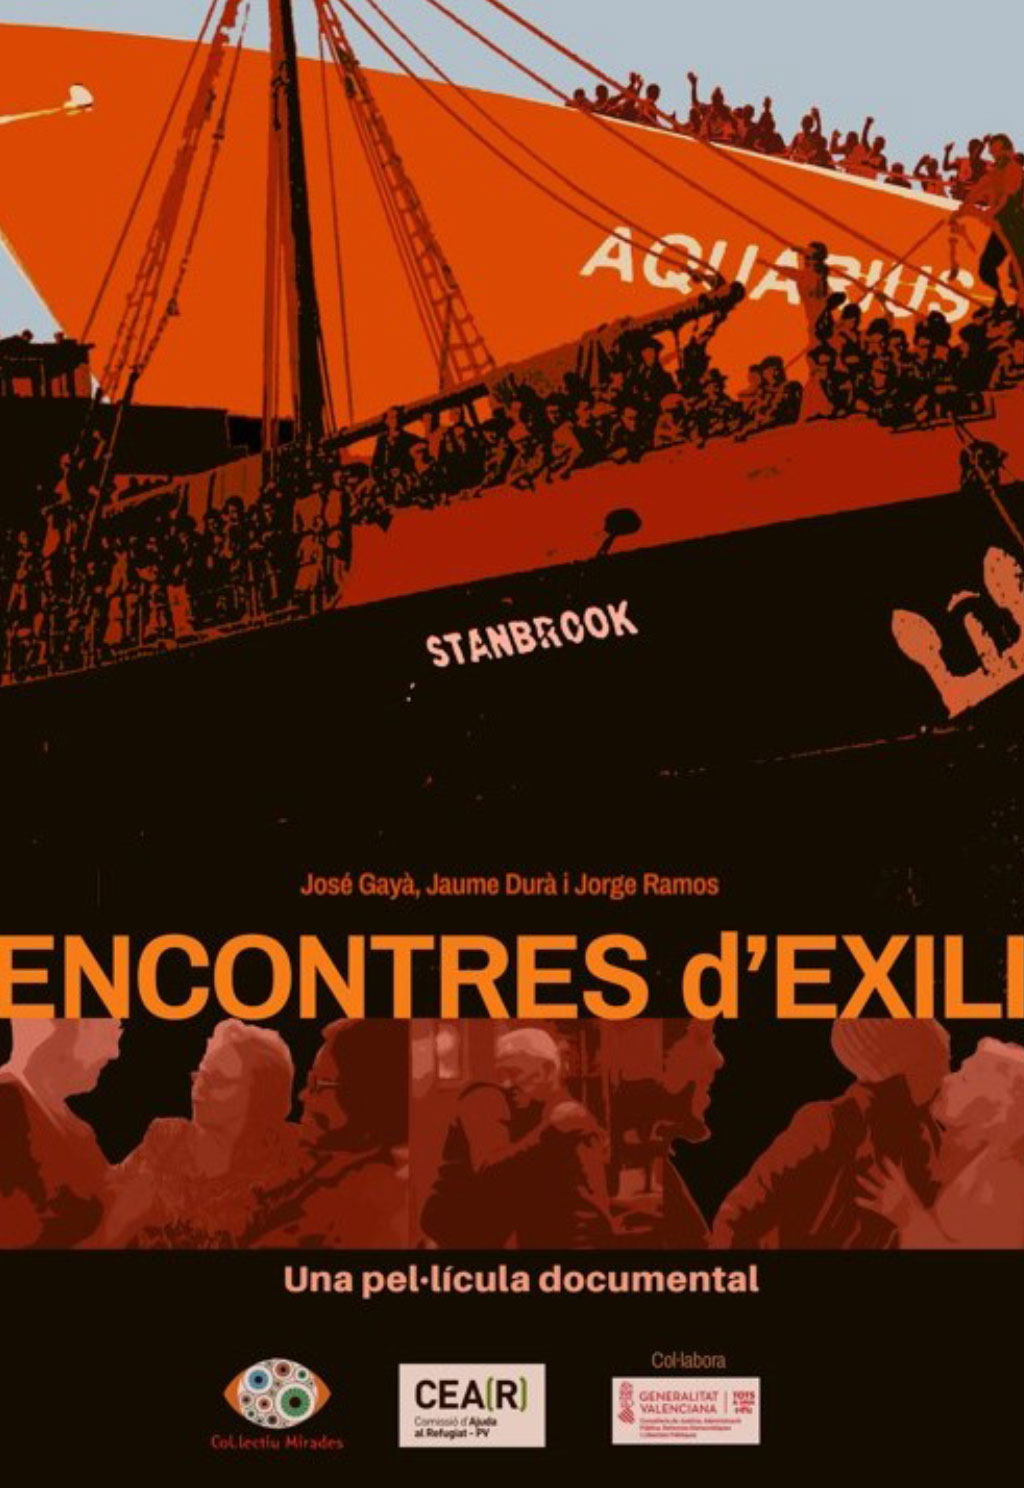 ENCONTRERS D'EXILI